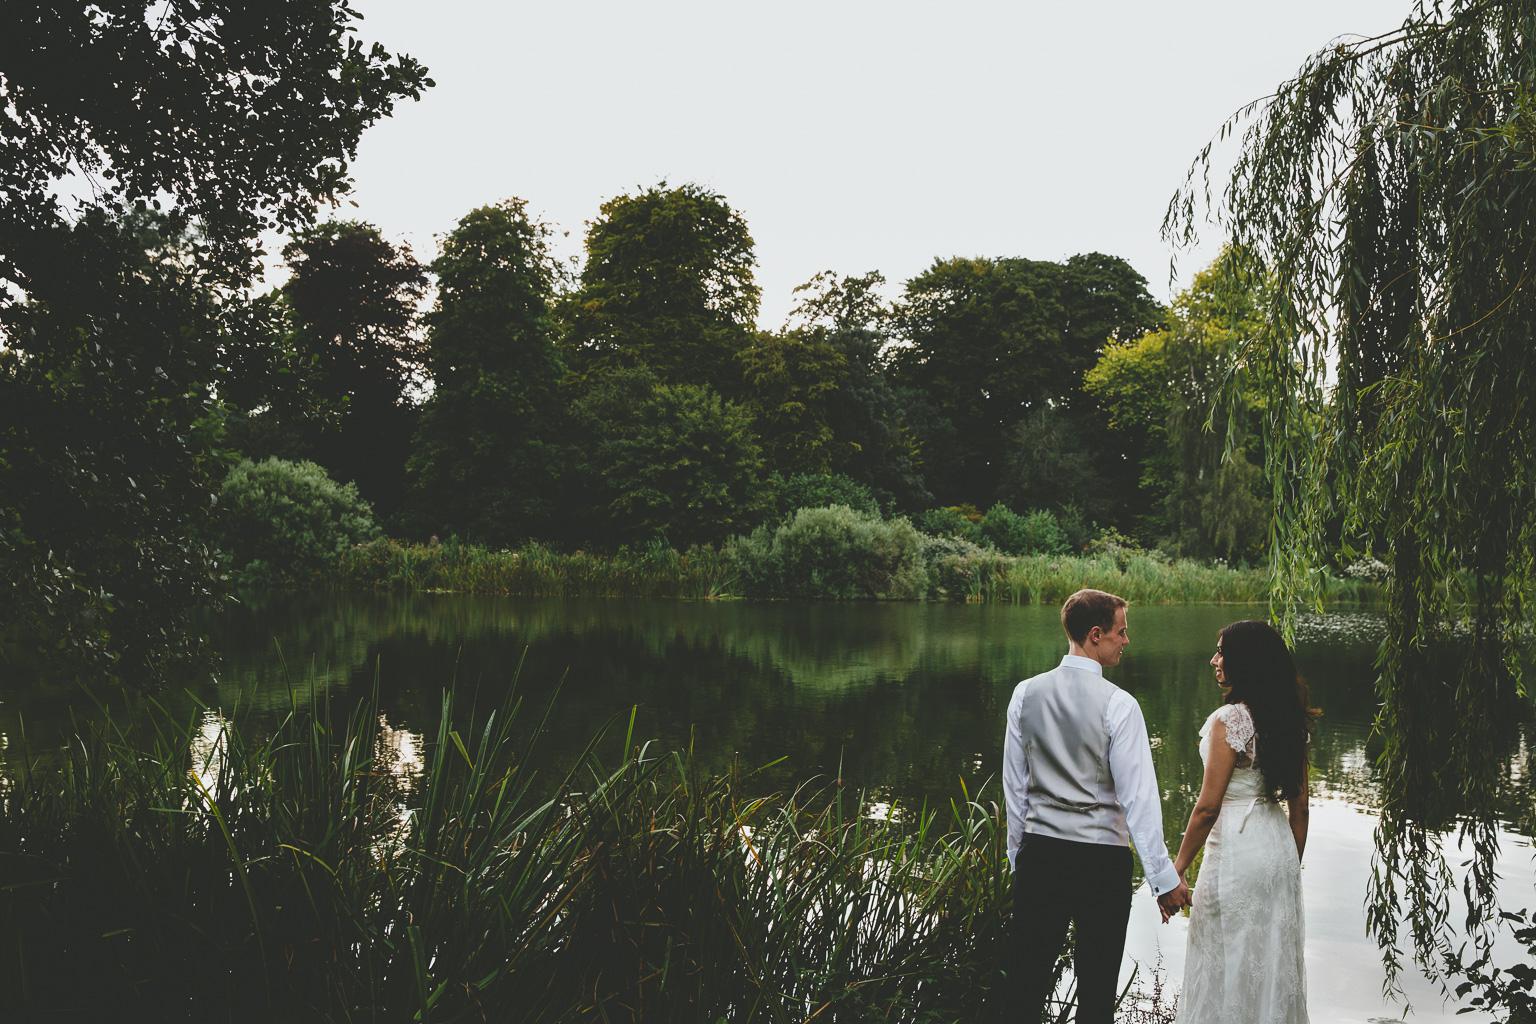 Destination-wedding-photography-00010